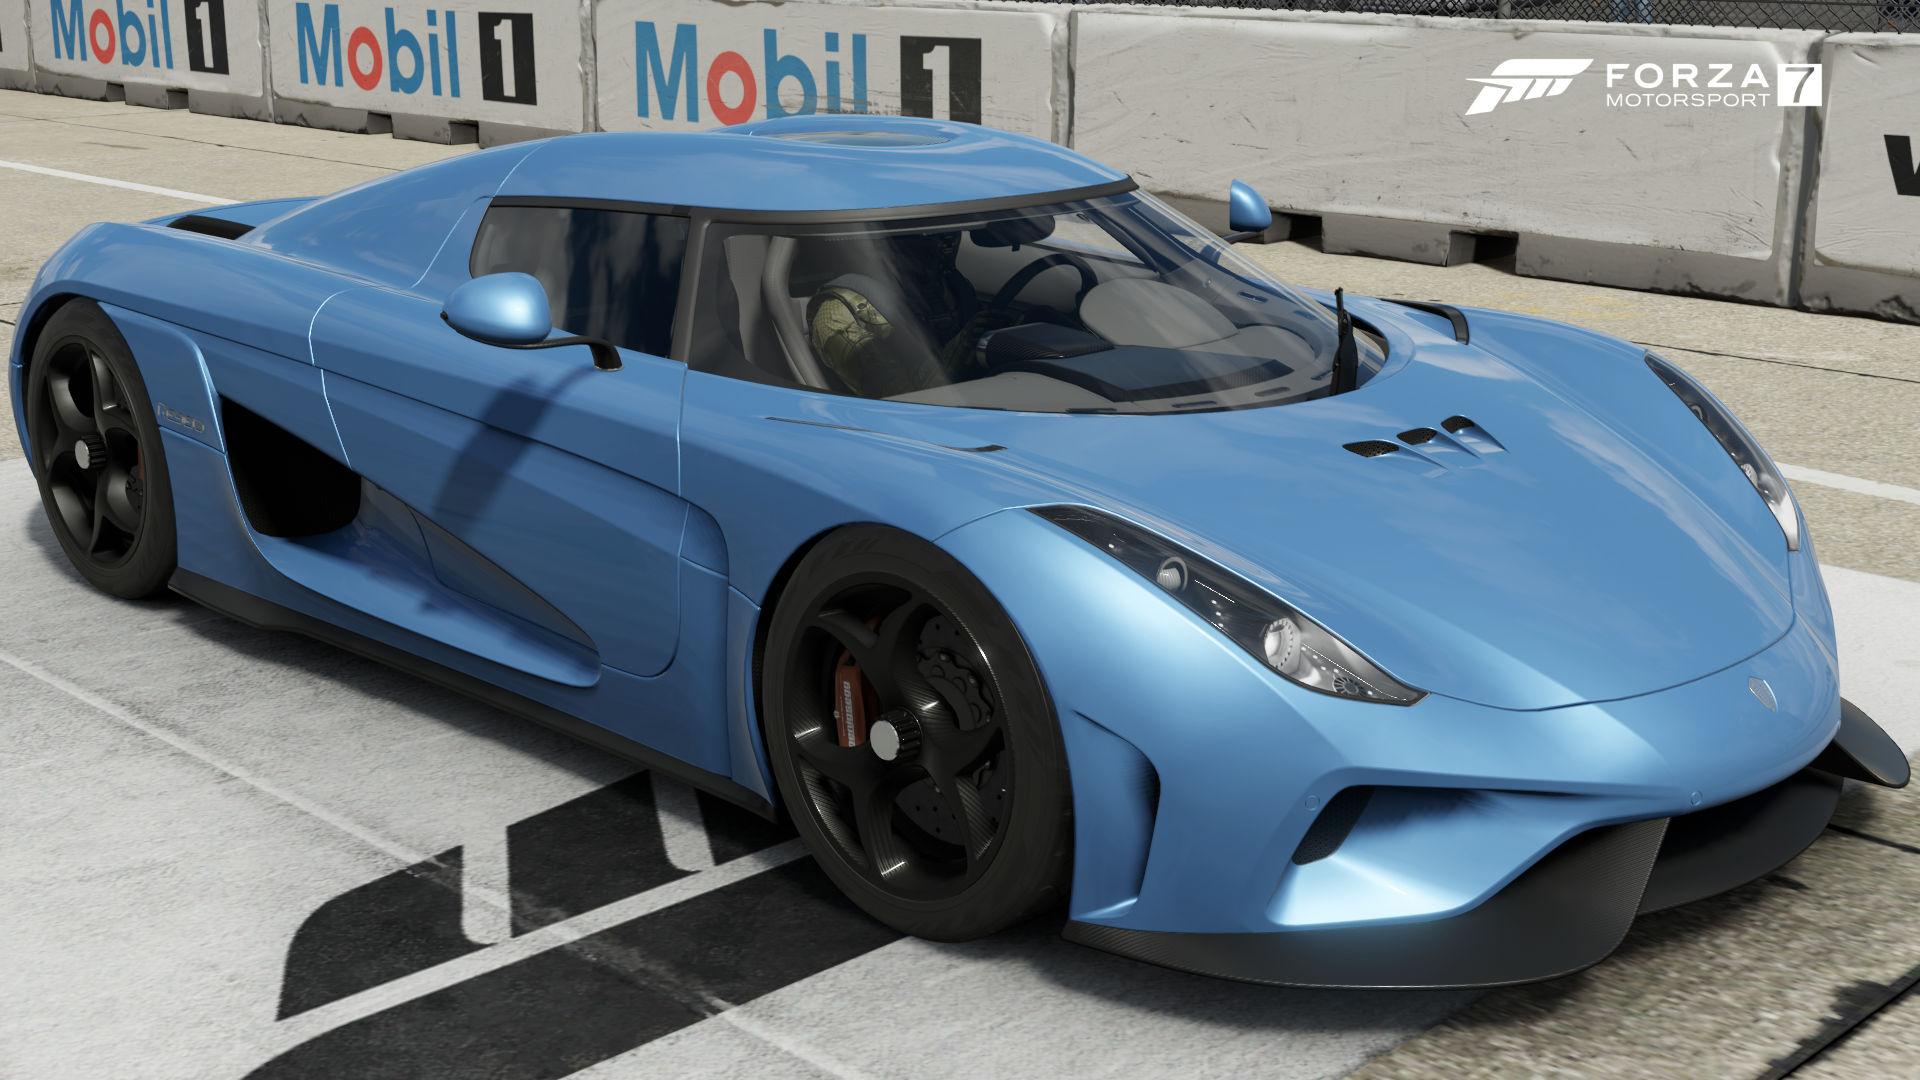 Image FM7 KoenigseggRegera Frontjpg Forza Motorsport Wiki